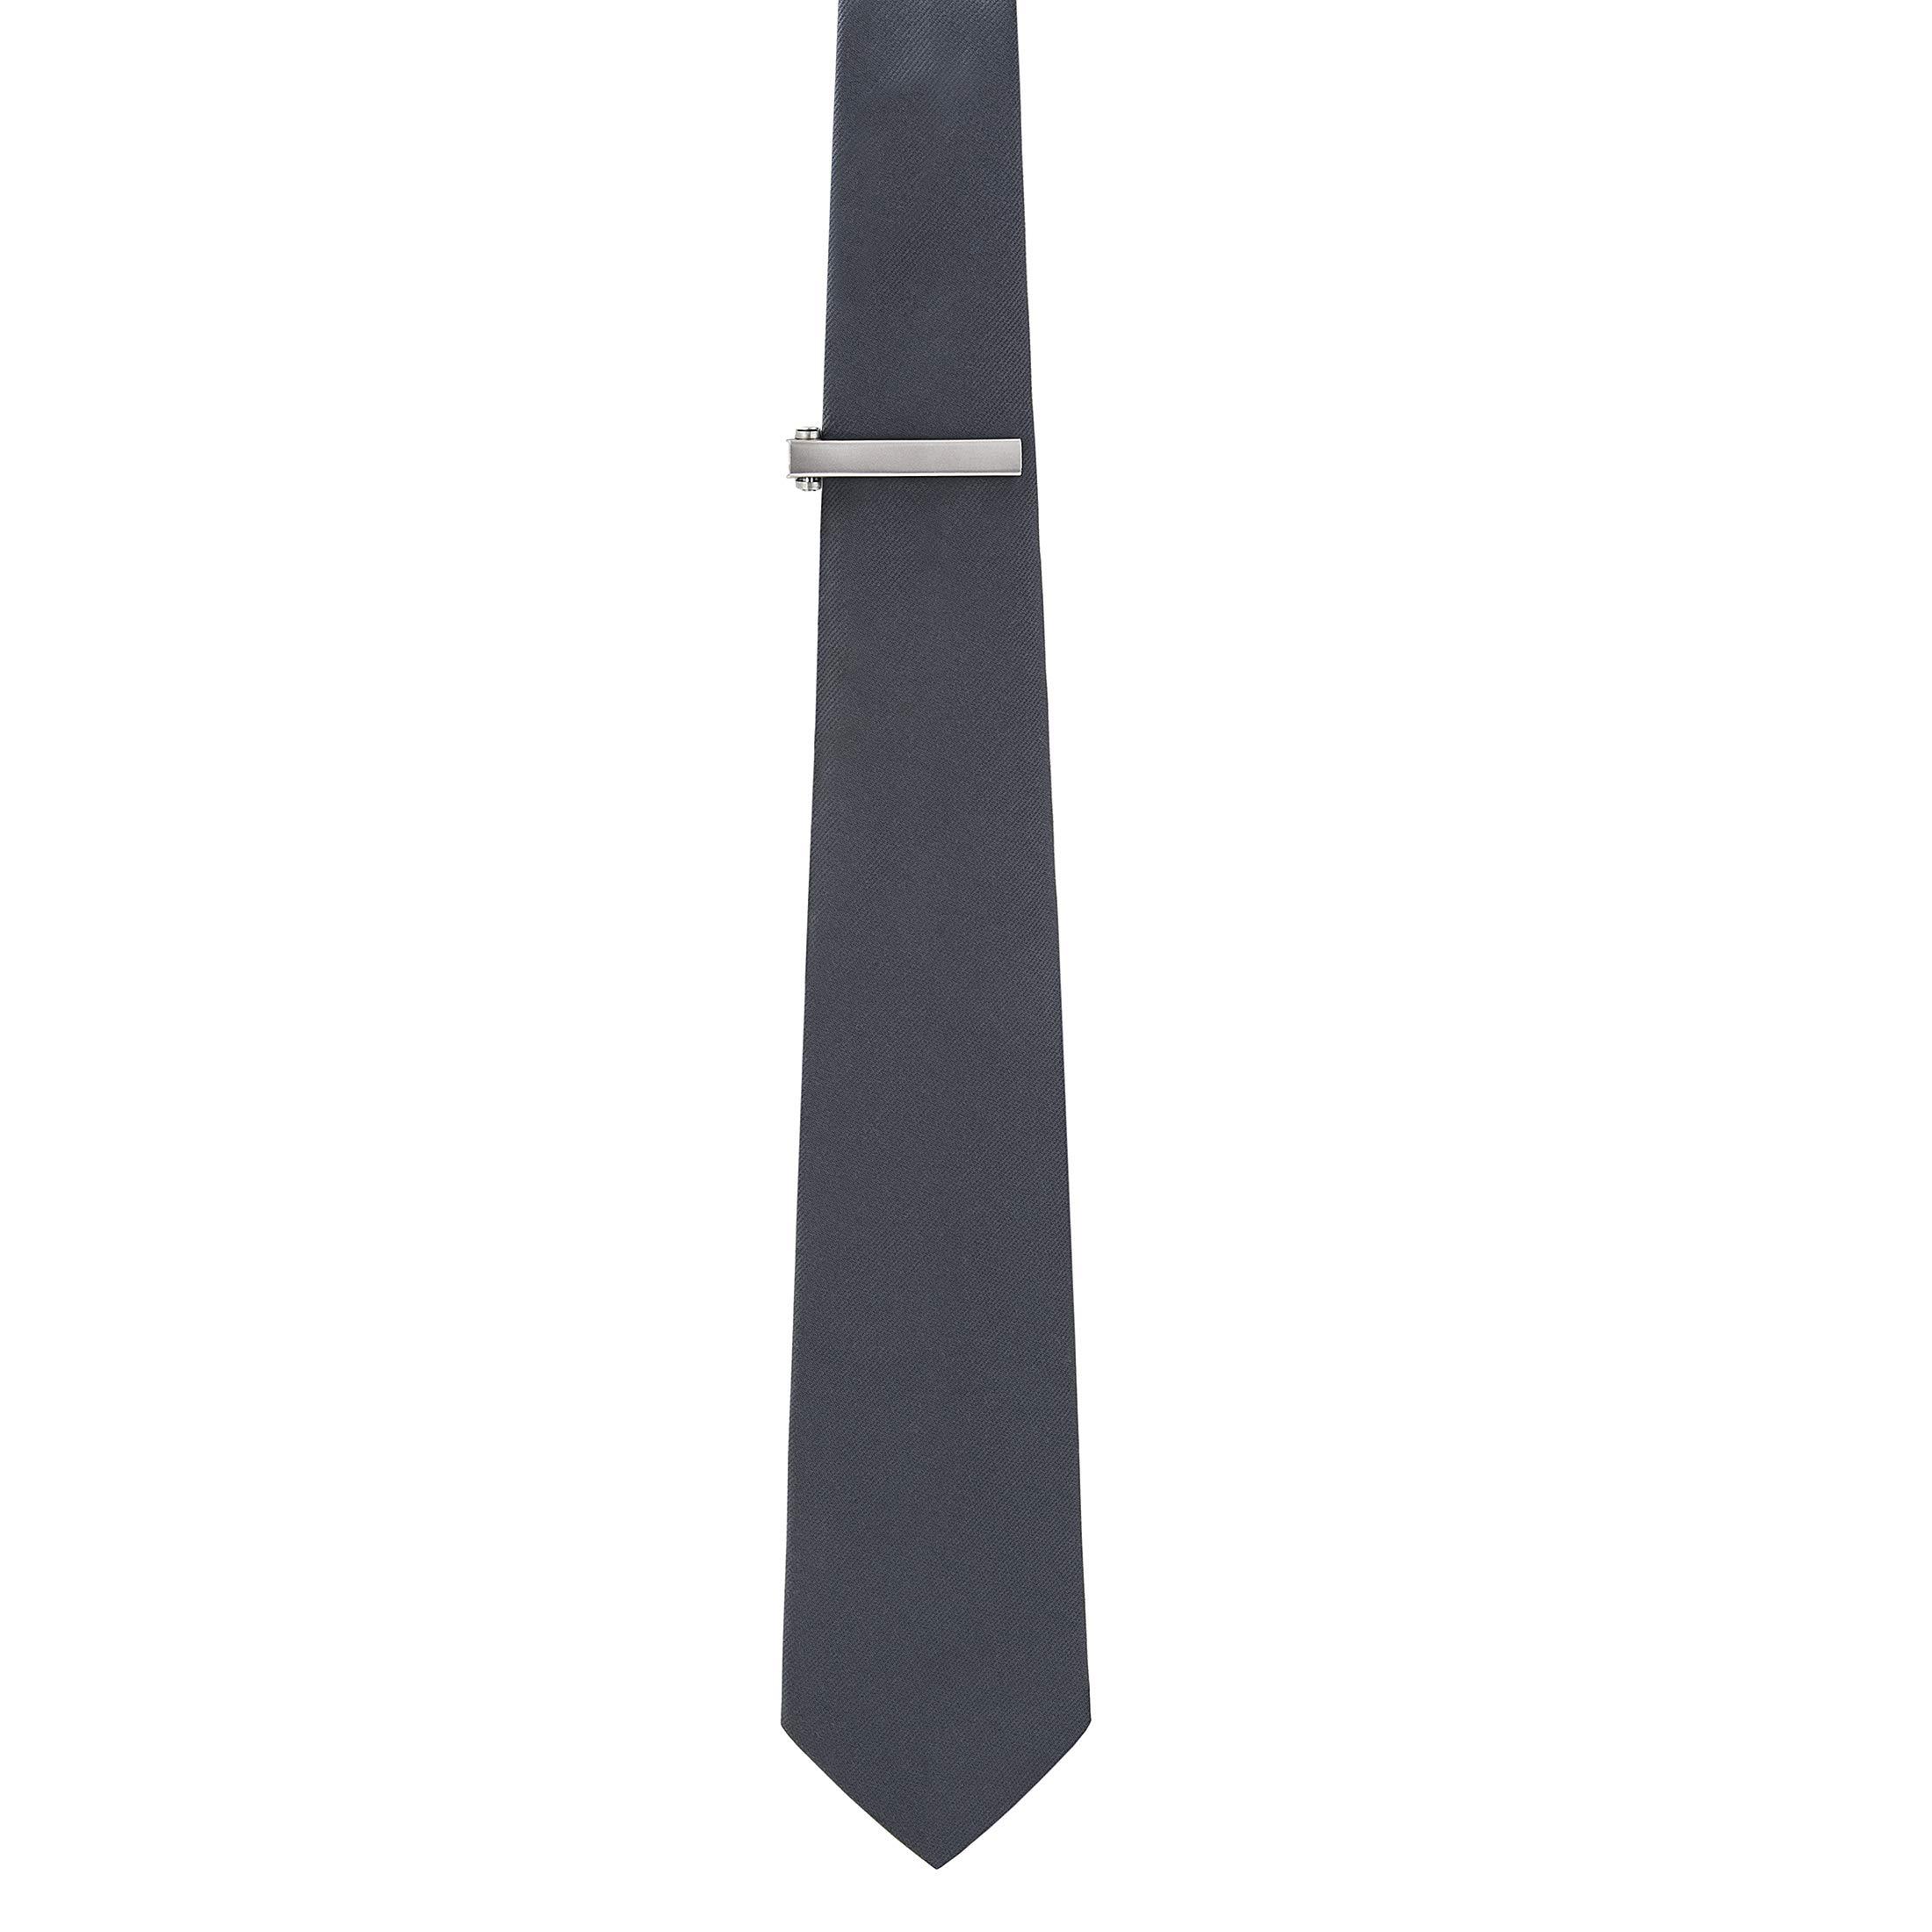 PRYCLIP - Tie Clip Bottle Opener, Laser Engraved, Gift Bag Included by PRYCLIP (Image #2)